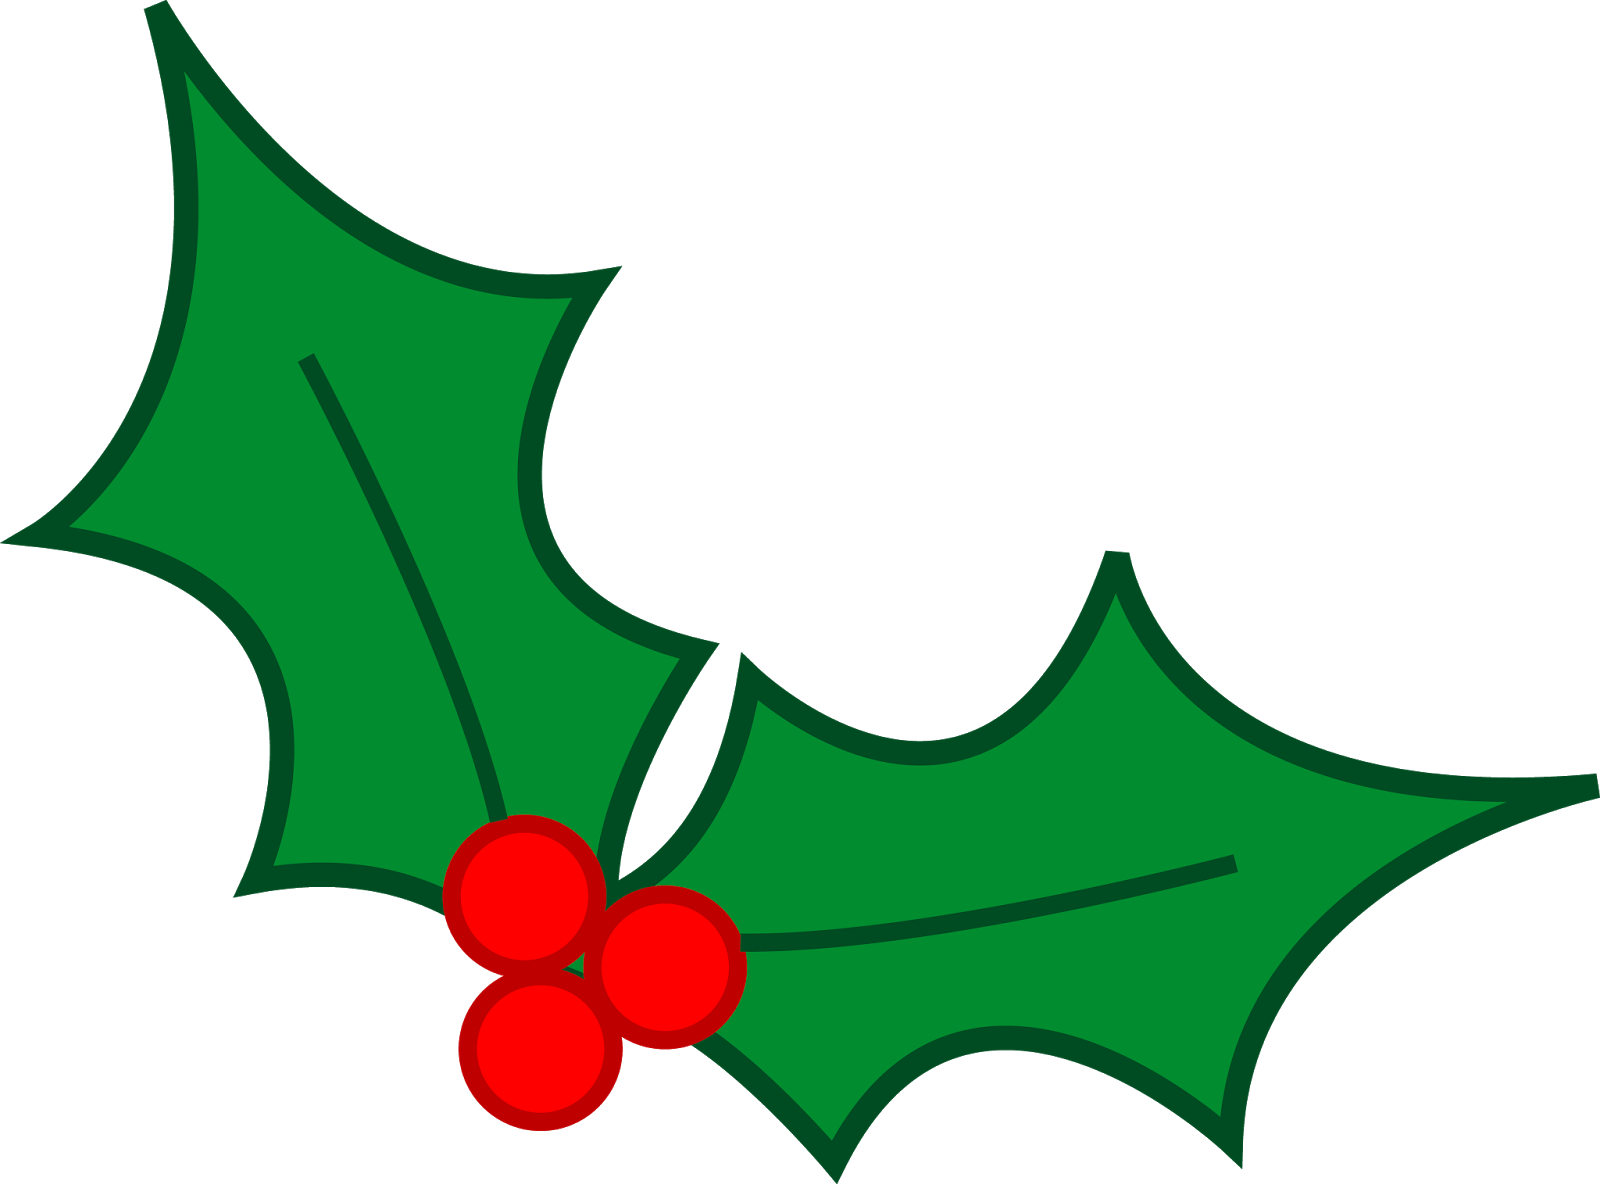 Christmas Tree Google Clip Ar - Google Clip Art Images Free